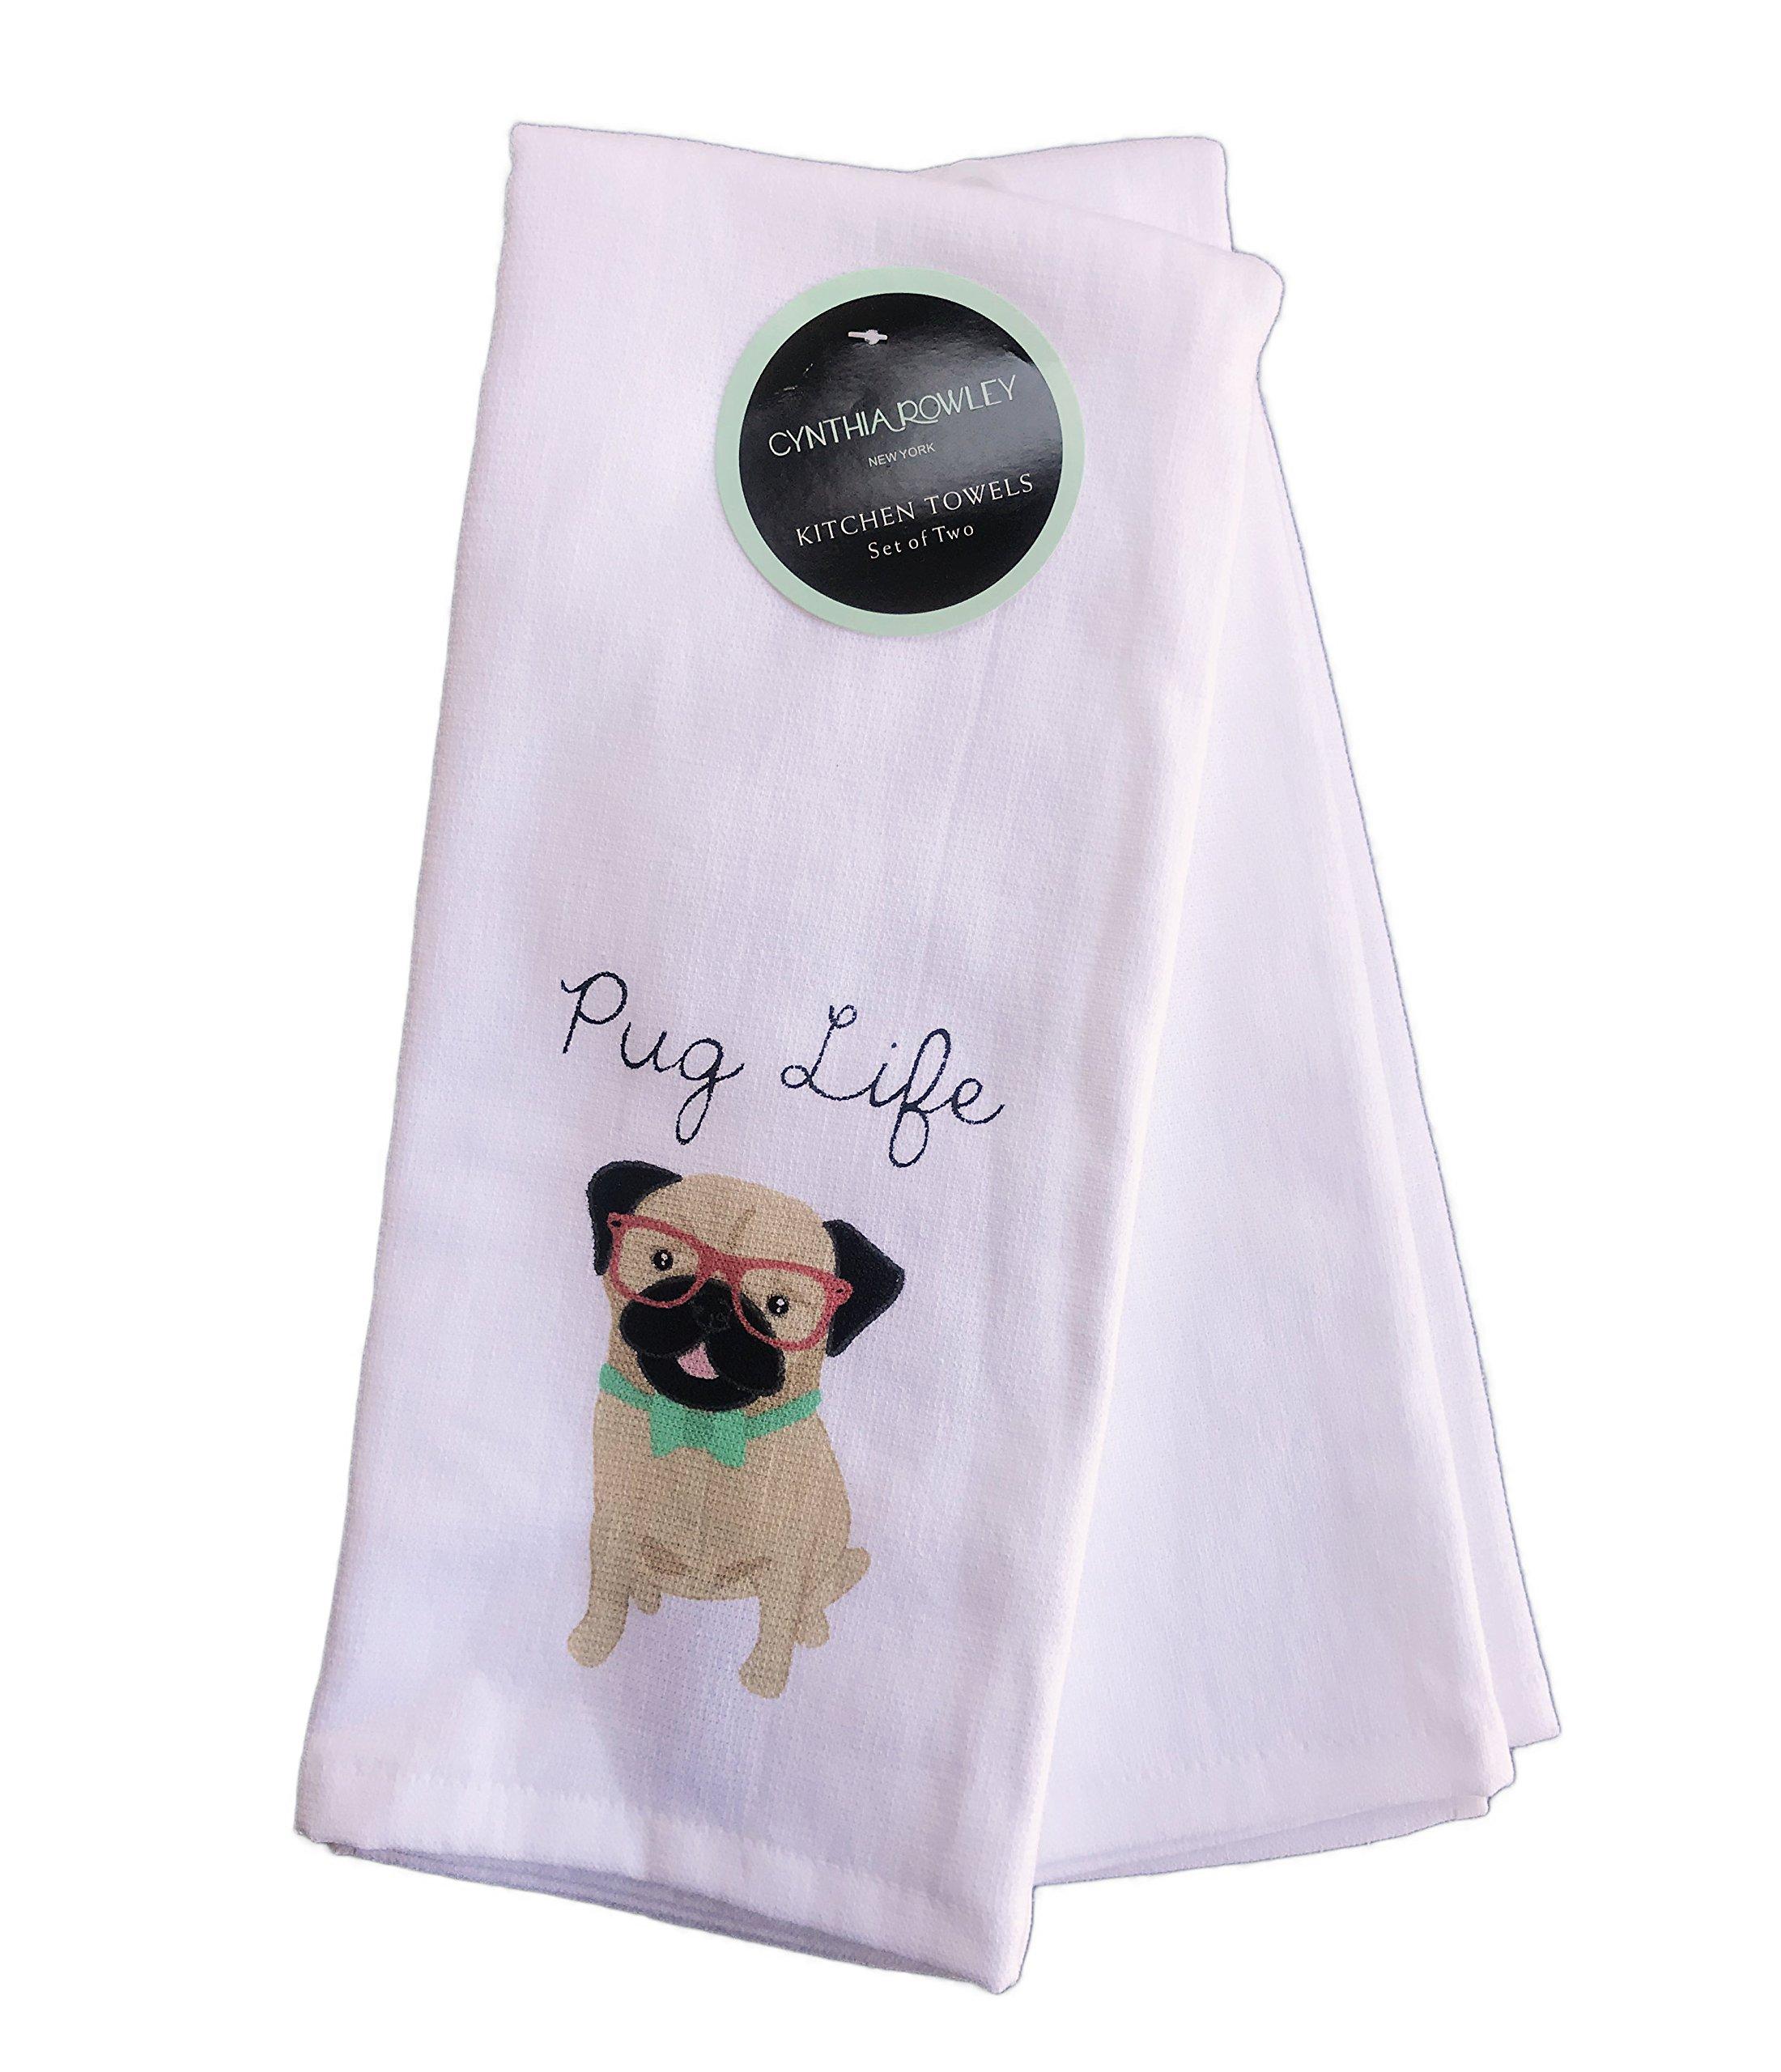 Cynthia Rowley set of 2 Kitchen Towels Cotton Pug Dog ''It's a Pug Life''